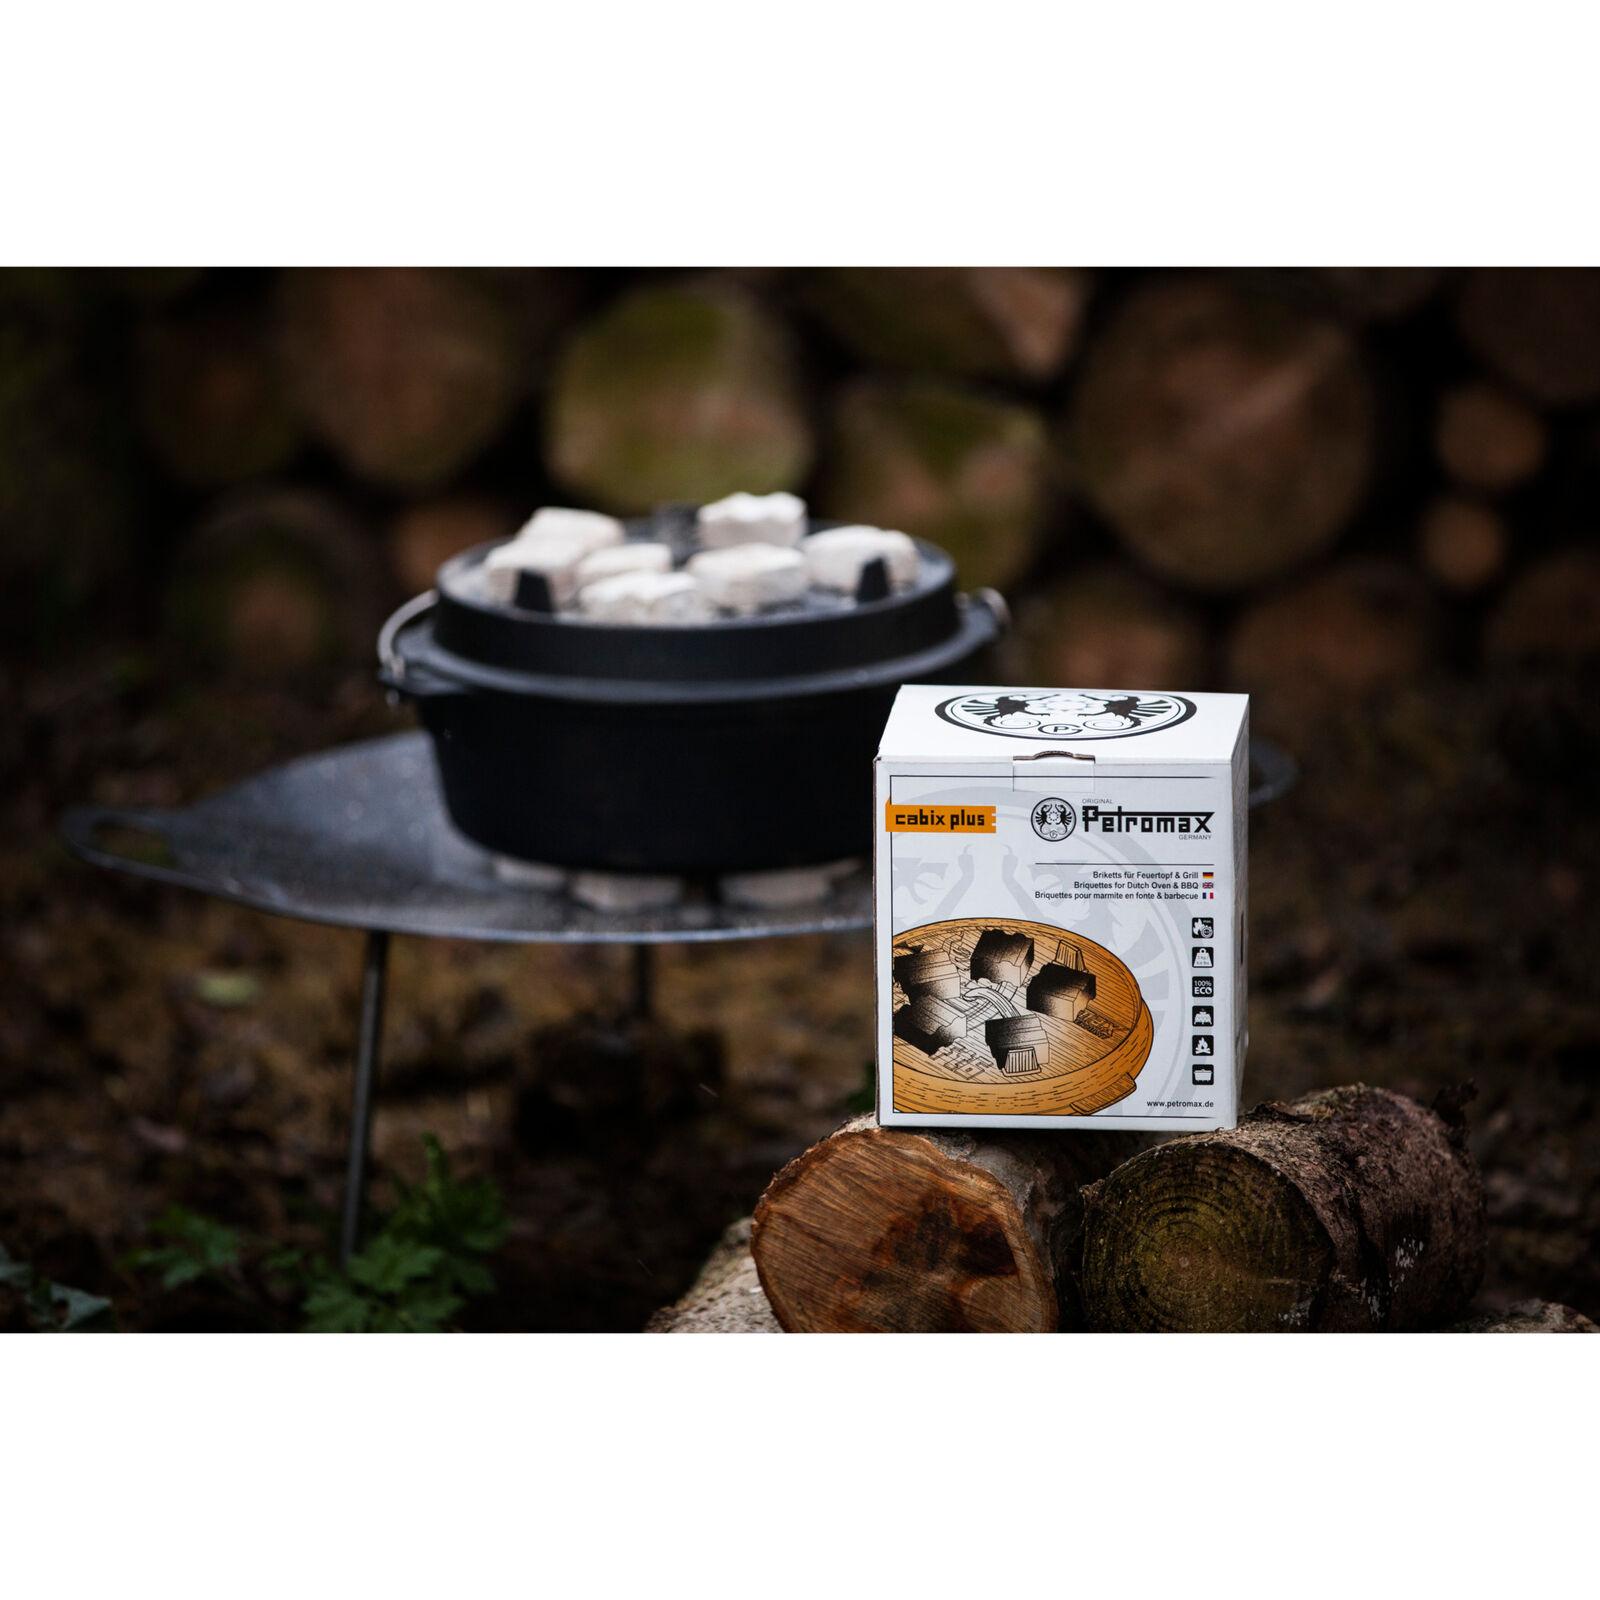 Petromax Cabix Plus Briketts f Dutch Oven /& BBQ Feuertopf Kokos Kohle Grill 3kg